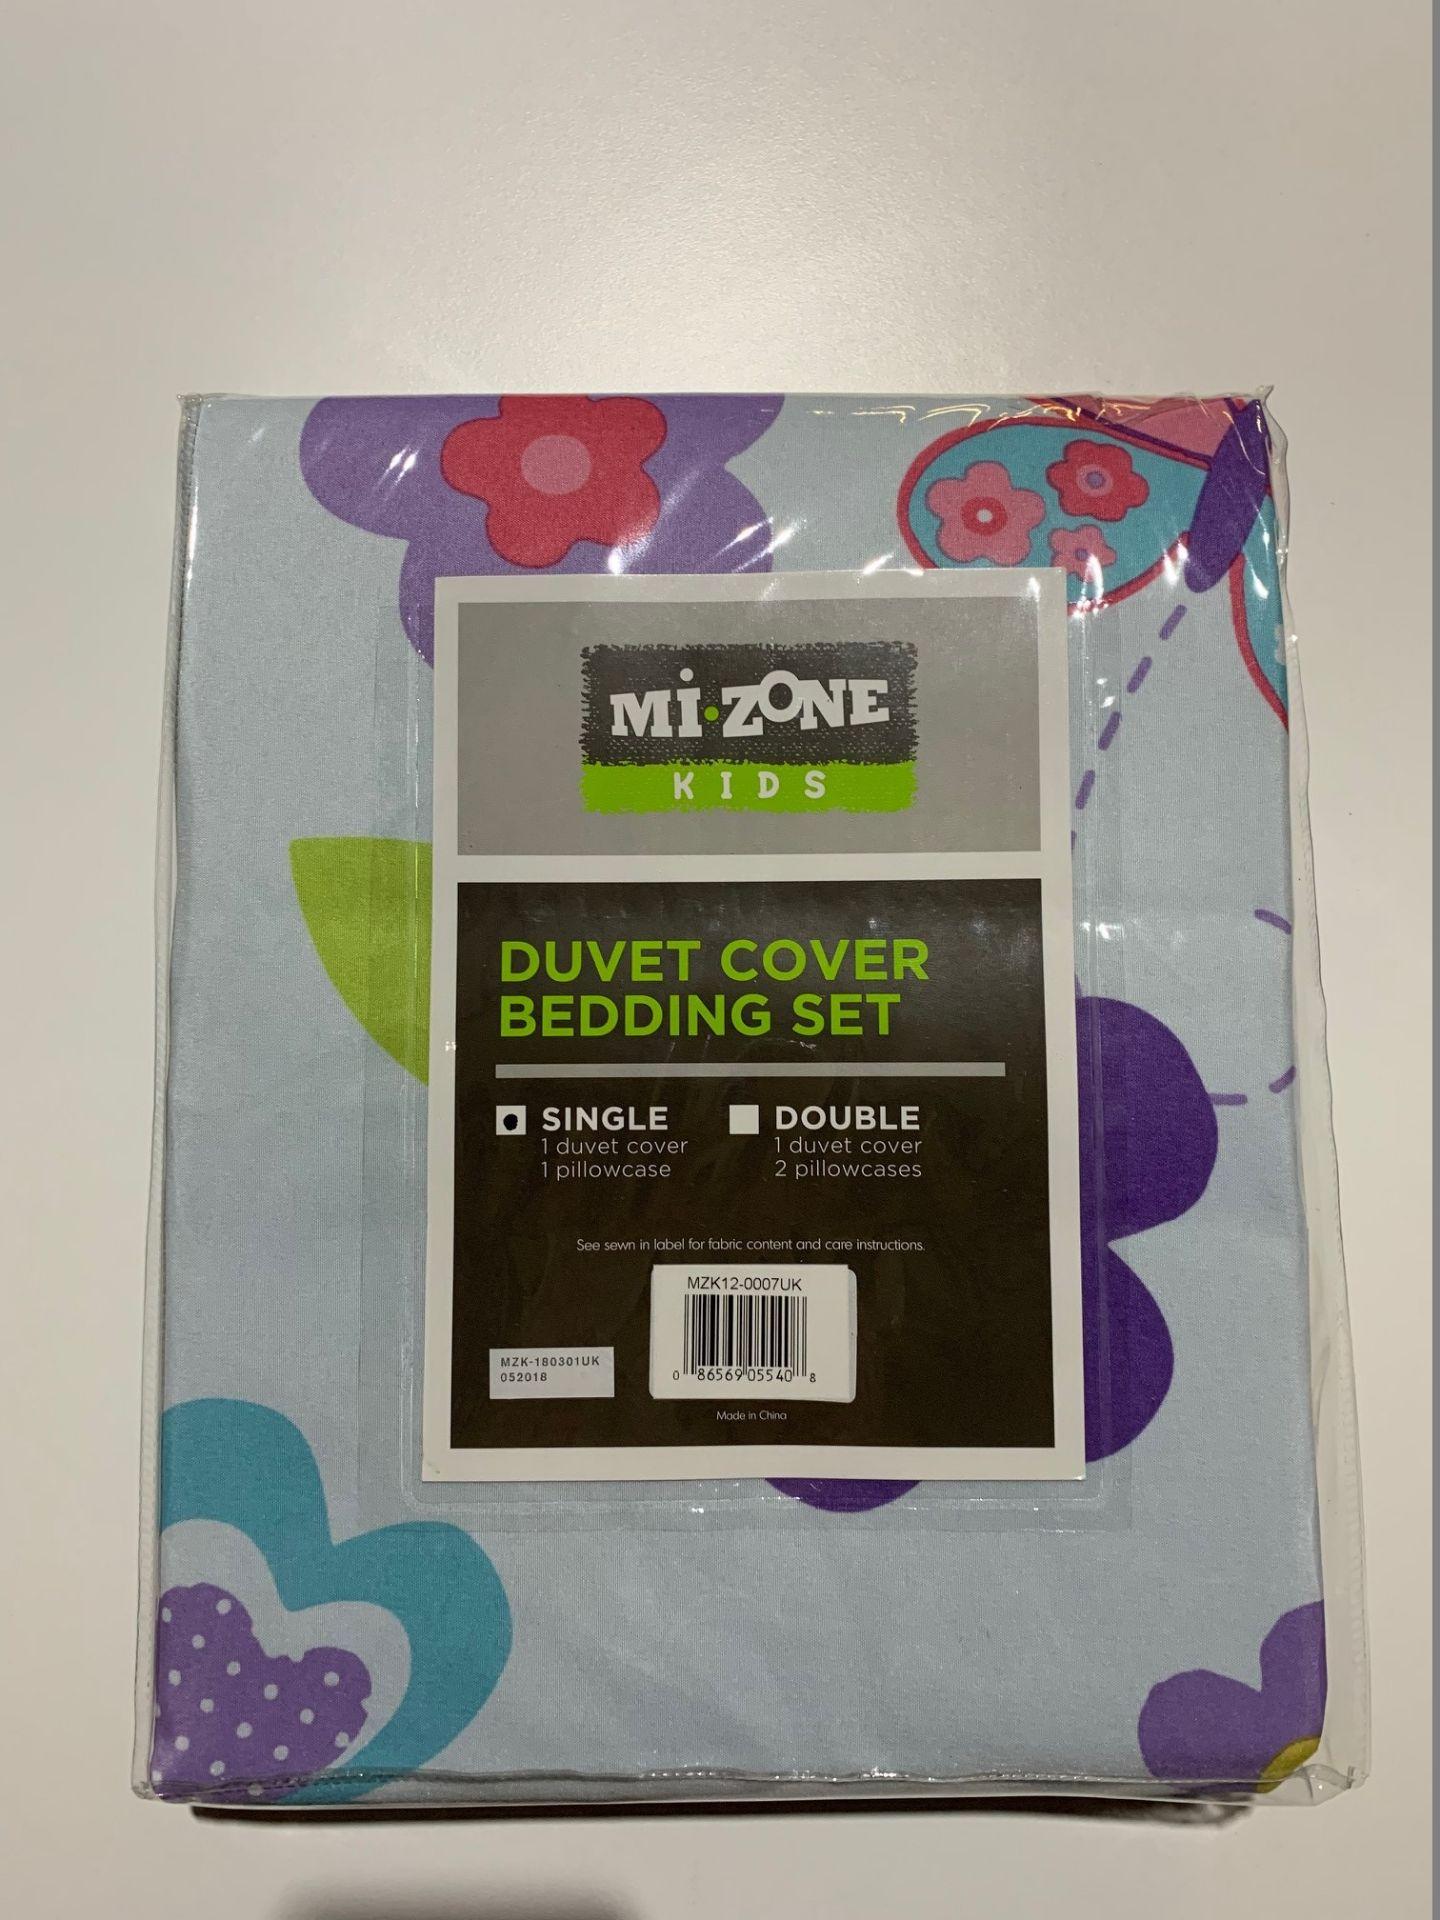 Lot 82 - 1 x Mi-Zone Fluttering Farrah Single Duvet Set - Product Code MZ12-0007UK (Brand New - RRP £21.99)